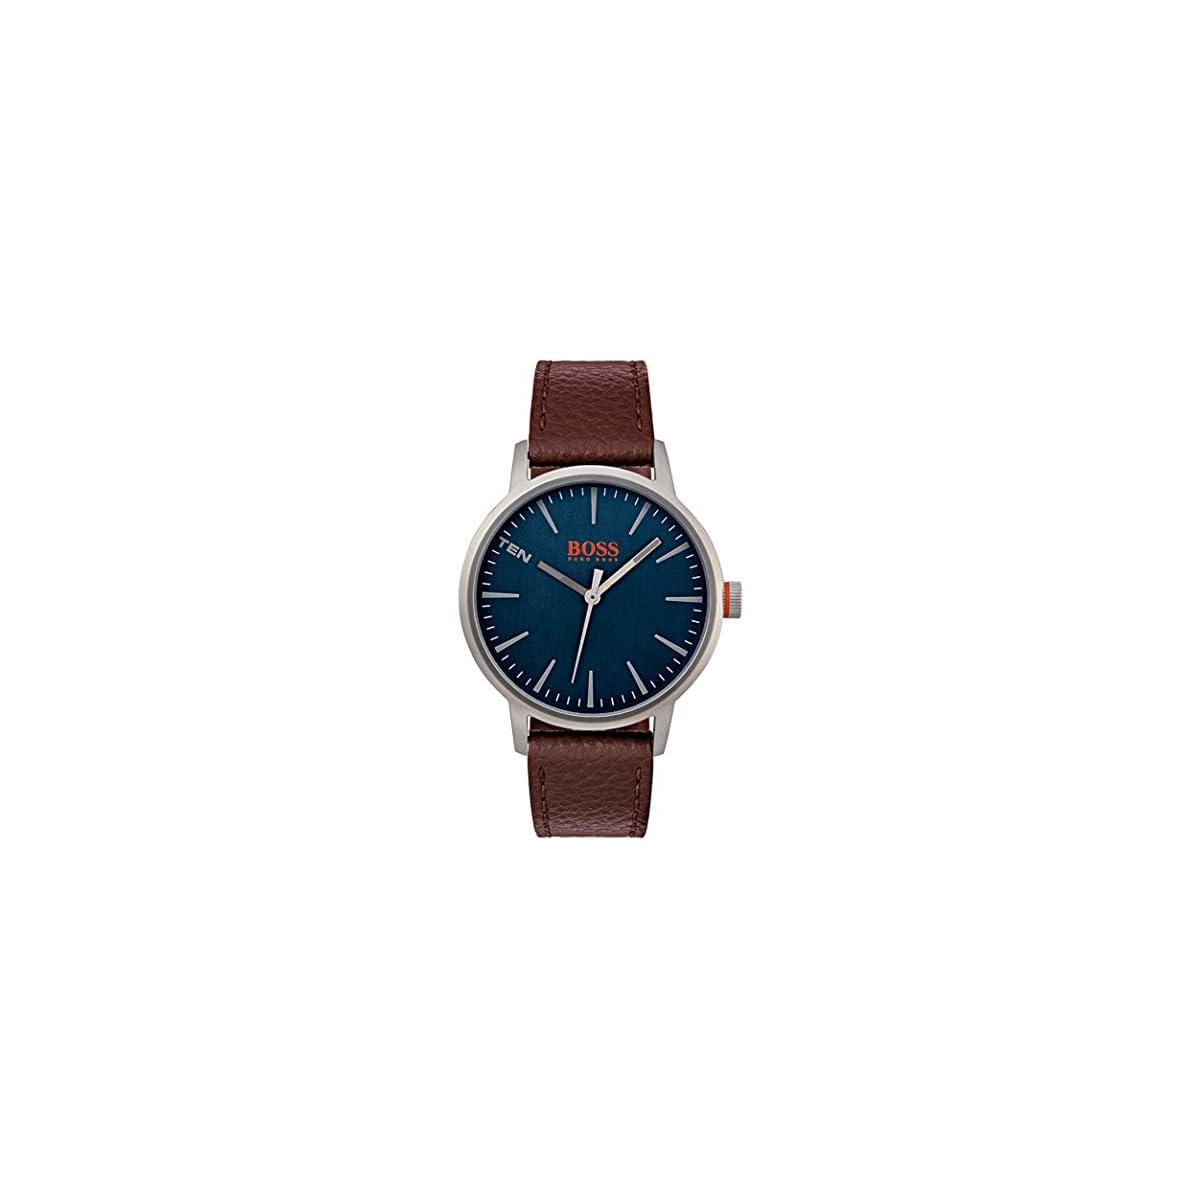 41sPgrlQKAL. SS1200  - Hugo Boss Orange Reloj Análogo clásico para Hombre de Cuarzo con Correa en Cuero 1550057